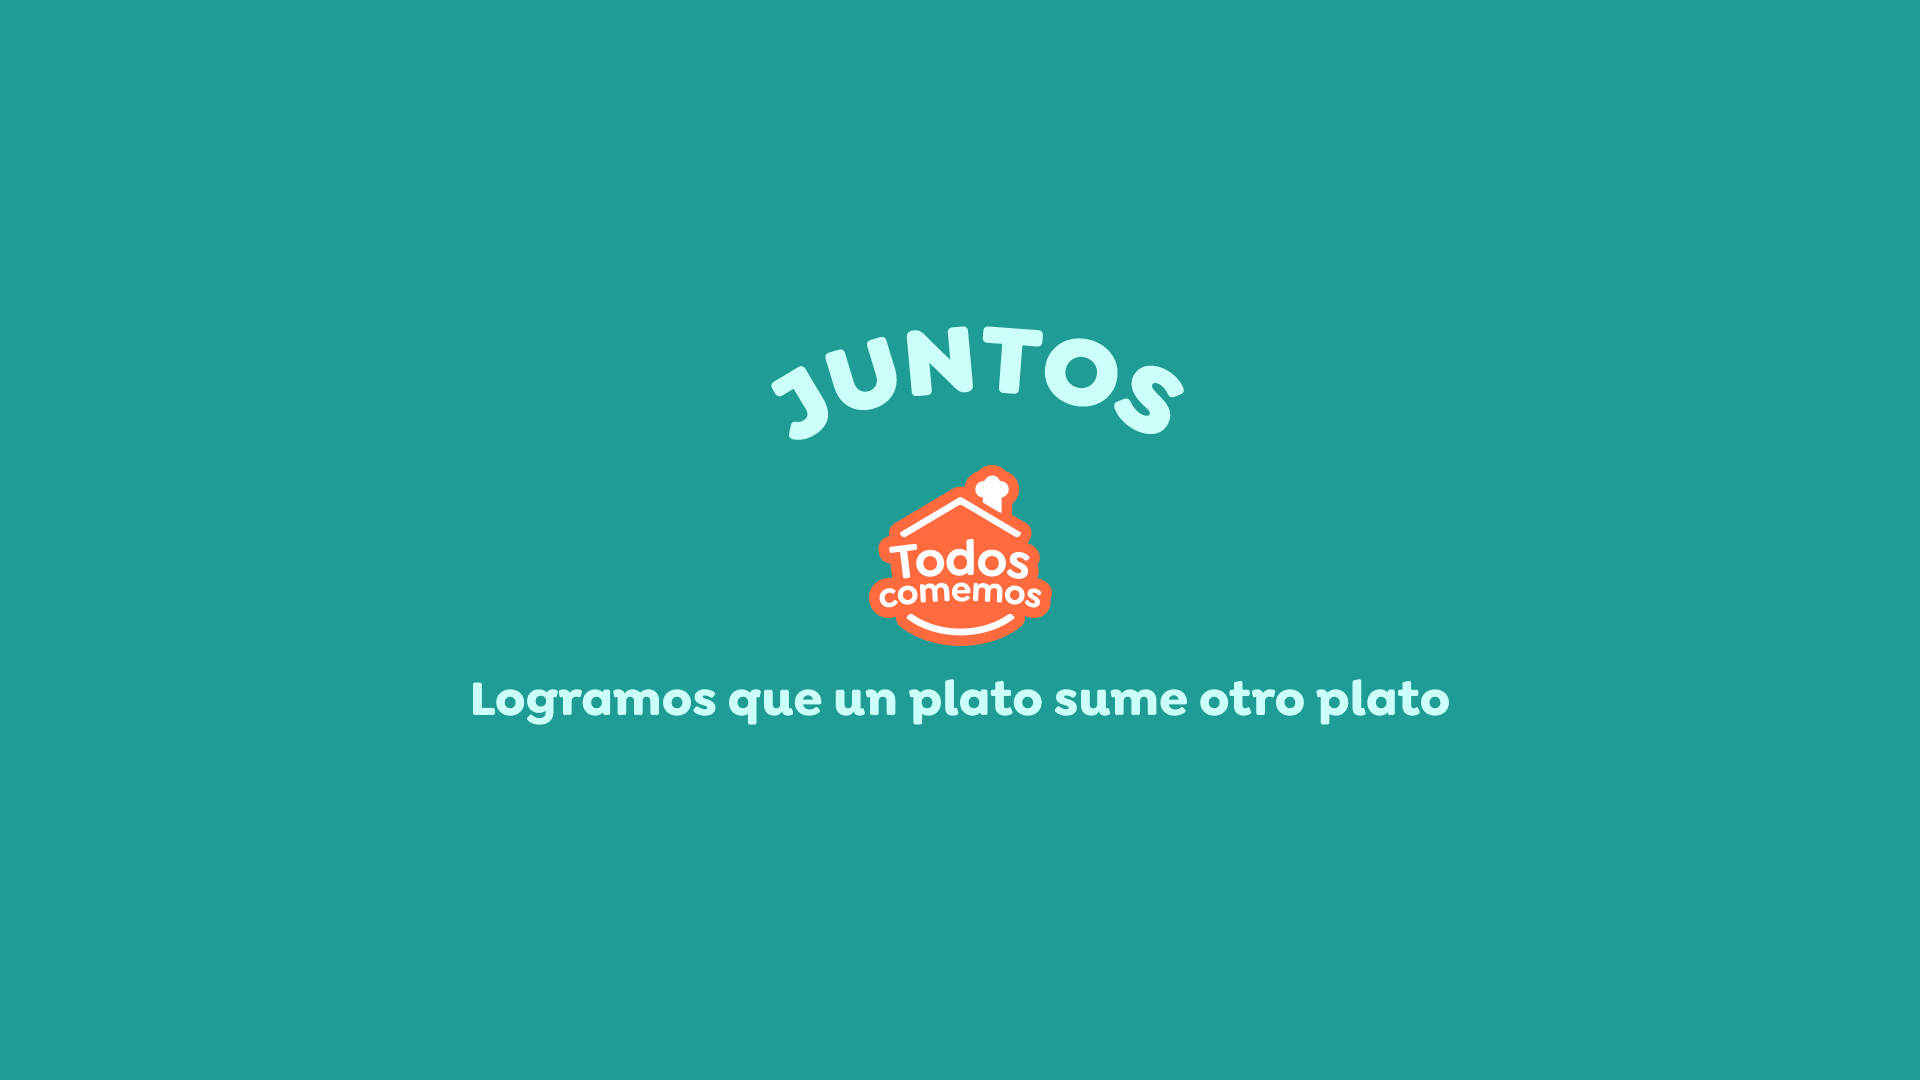 El Engalle Takes on Rebranding Todos Comemos a Food tech Startup